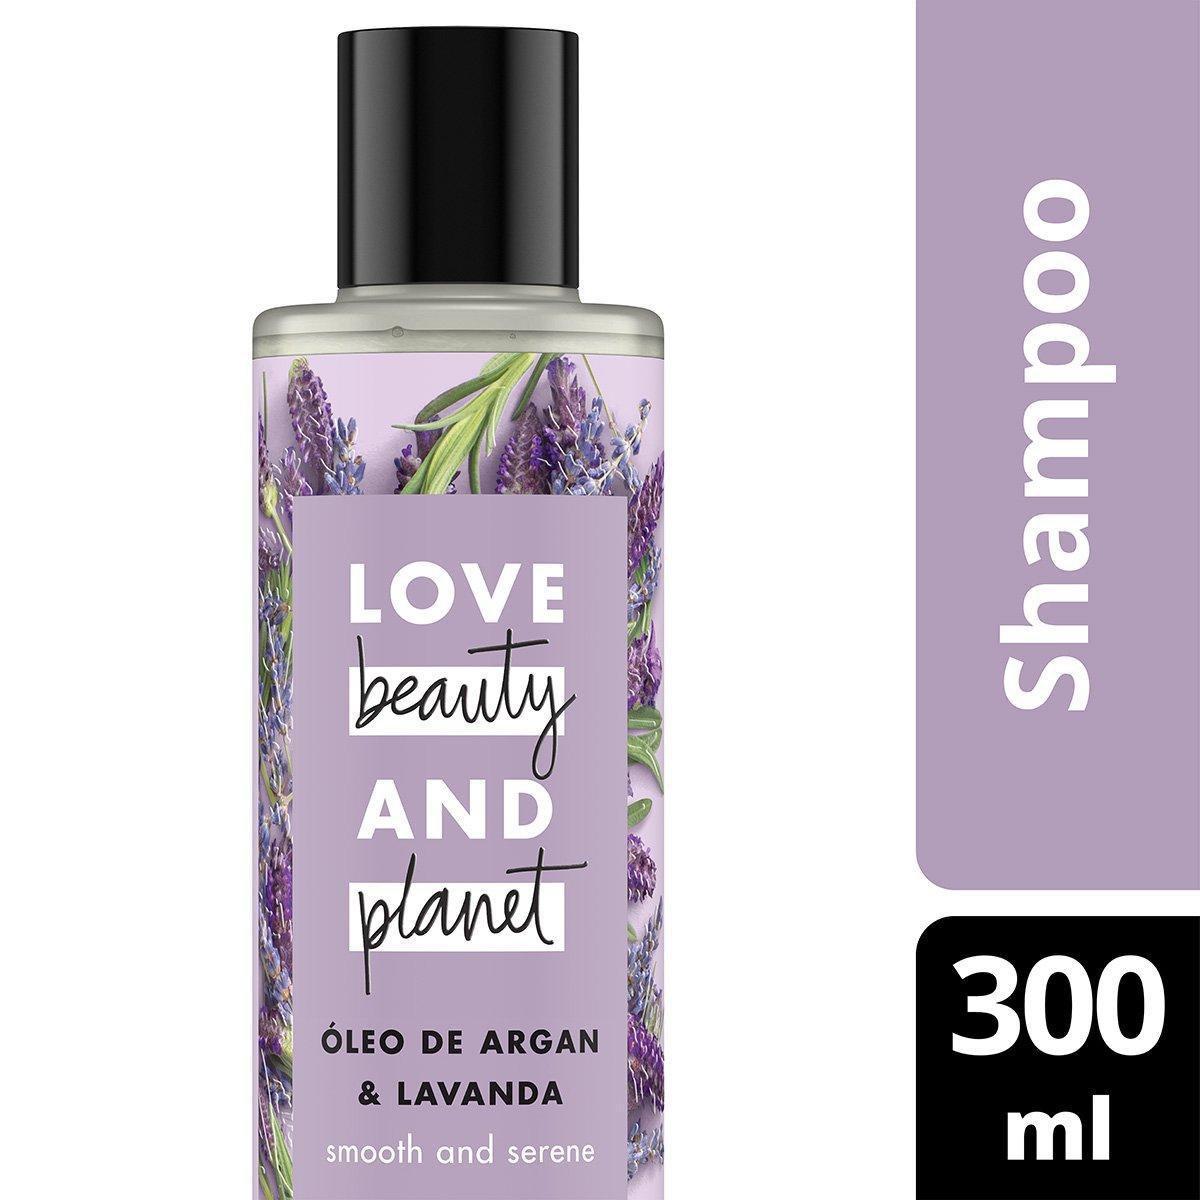 Shampoo Smooth and Serene Óleo de Argan & Lavanda Love Beauty and Planet 300ml